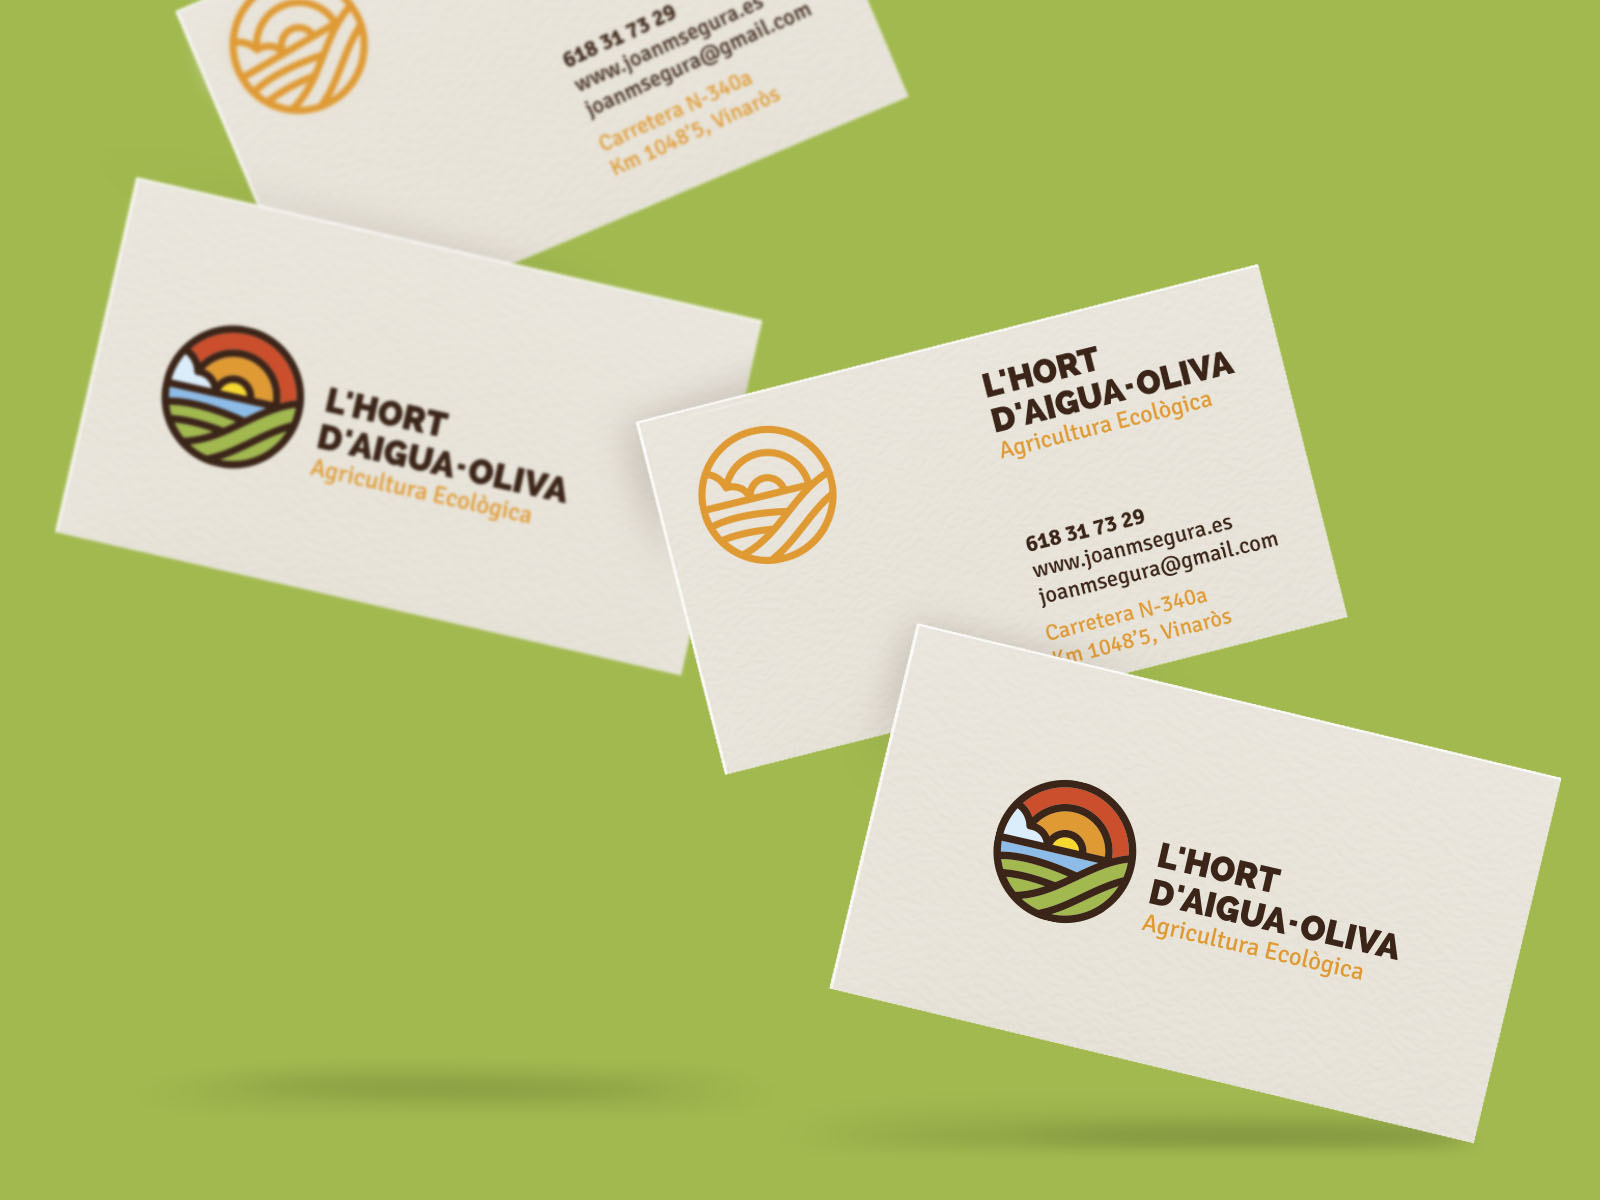 L'Hort d'Aigua-Oliva, diseño de logo, marca, identidad corporativa, logotipo, branding, packaging, tarjetas corporativas, agricultura ecológica